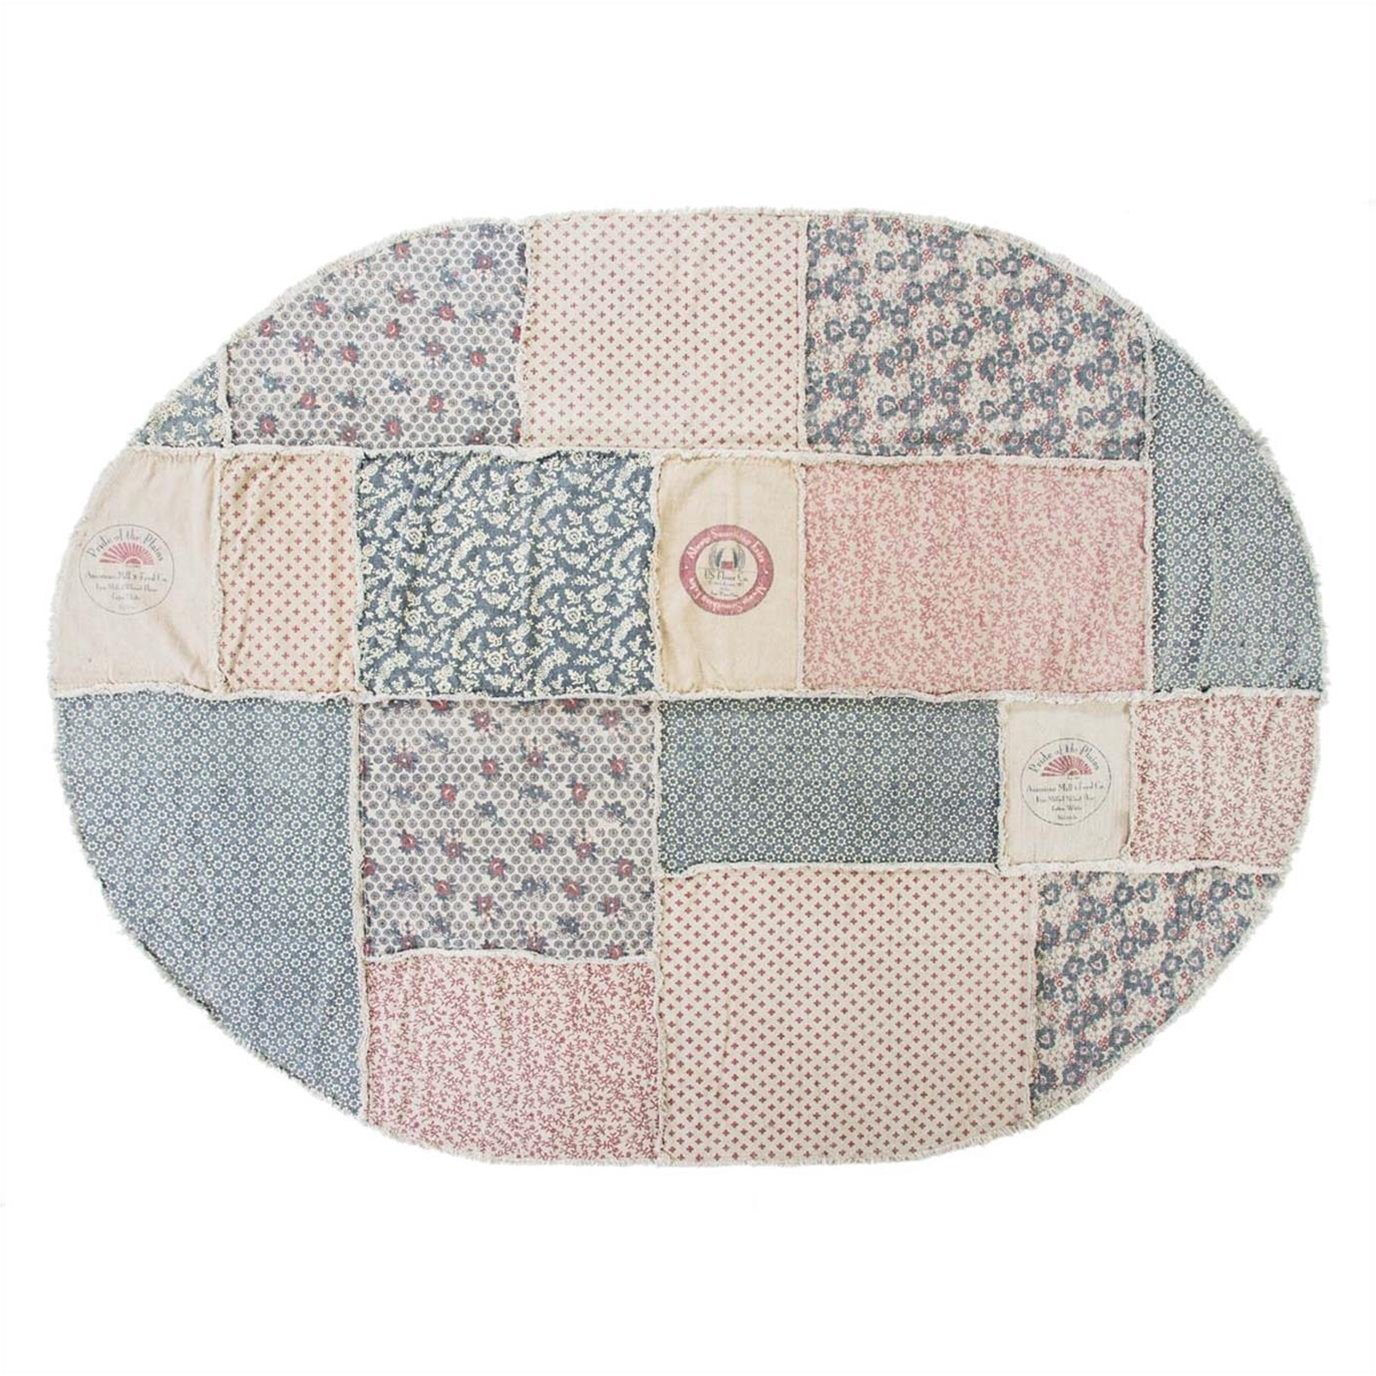 Millie Patchwork Rug Oval 96x132